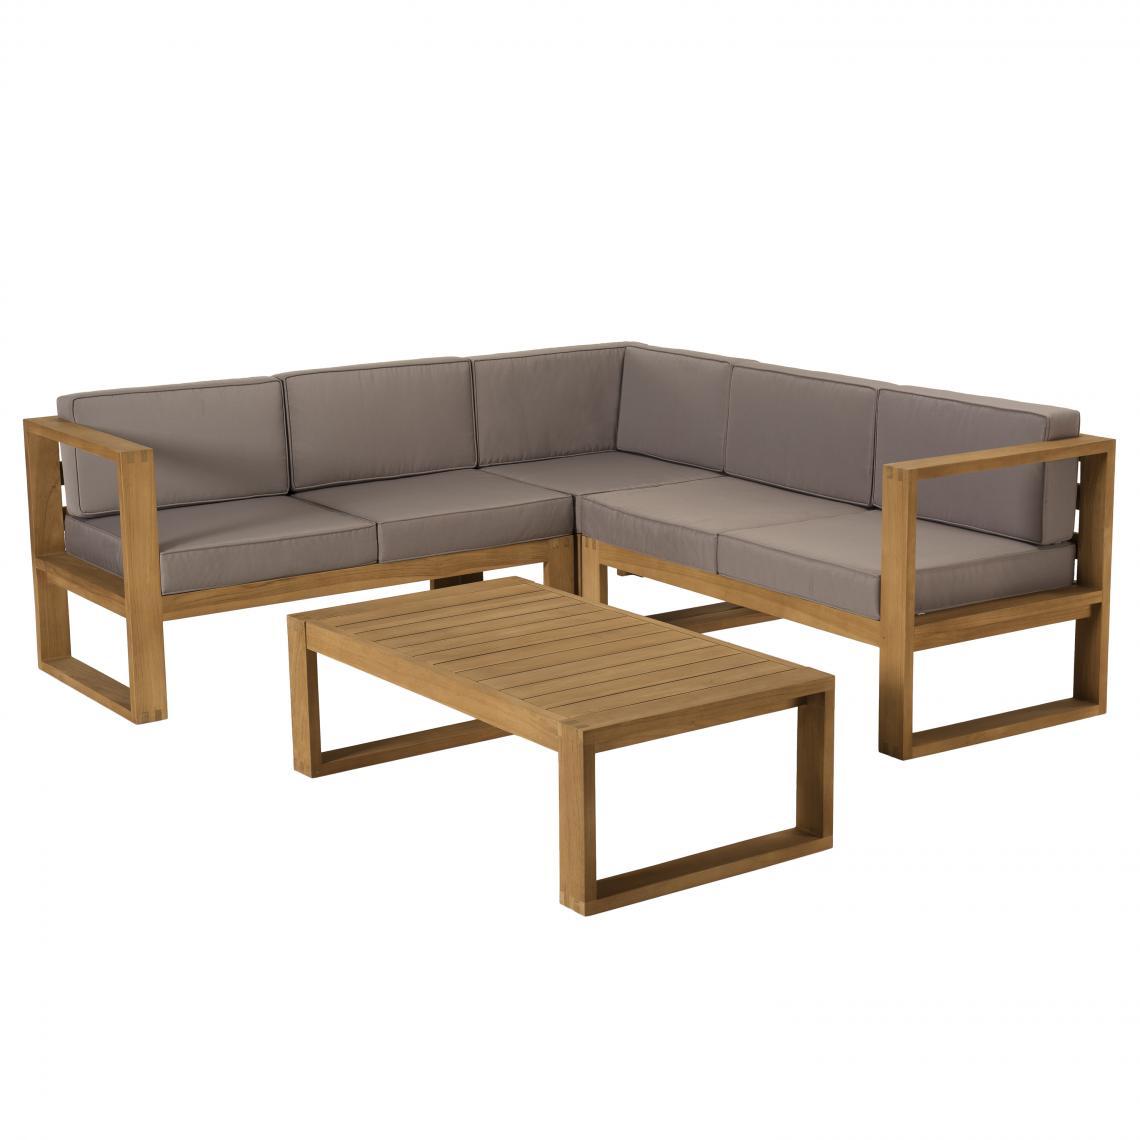 MACABANE Salon de jardin MINORQUE Table basse Teck + Canapé d'angle 5 places